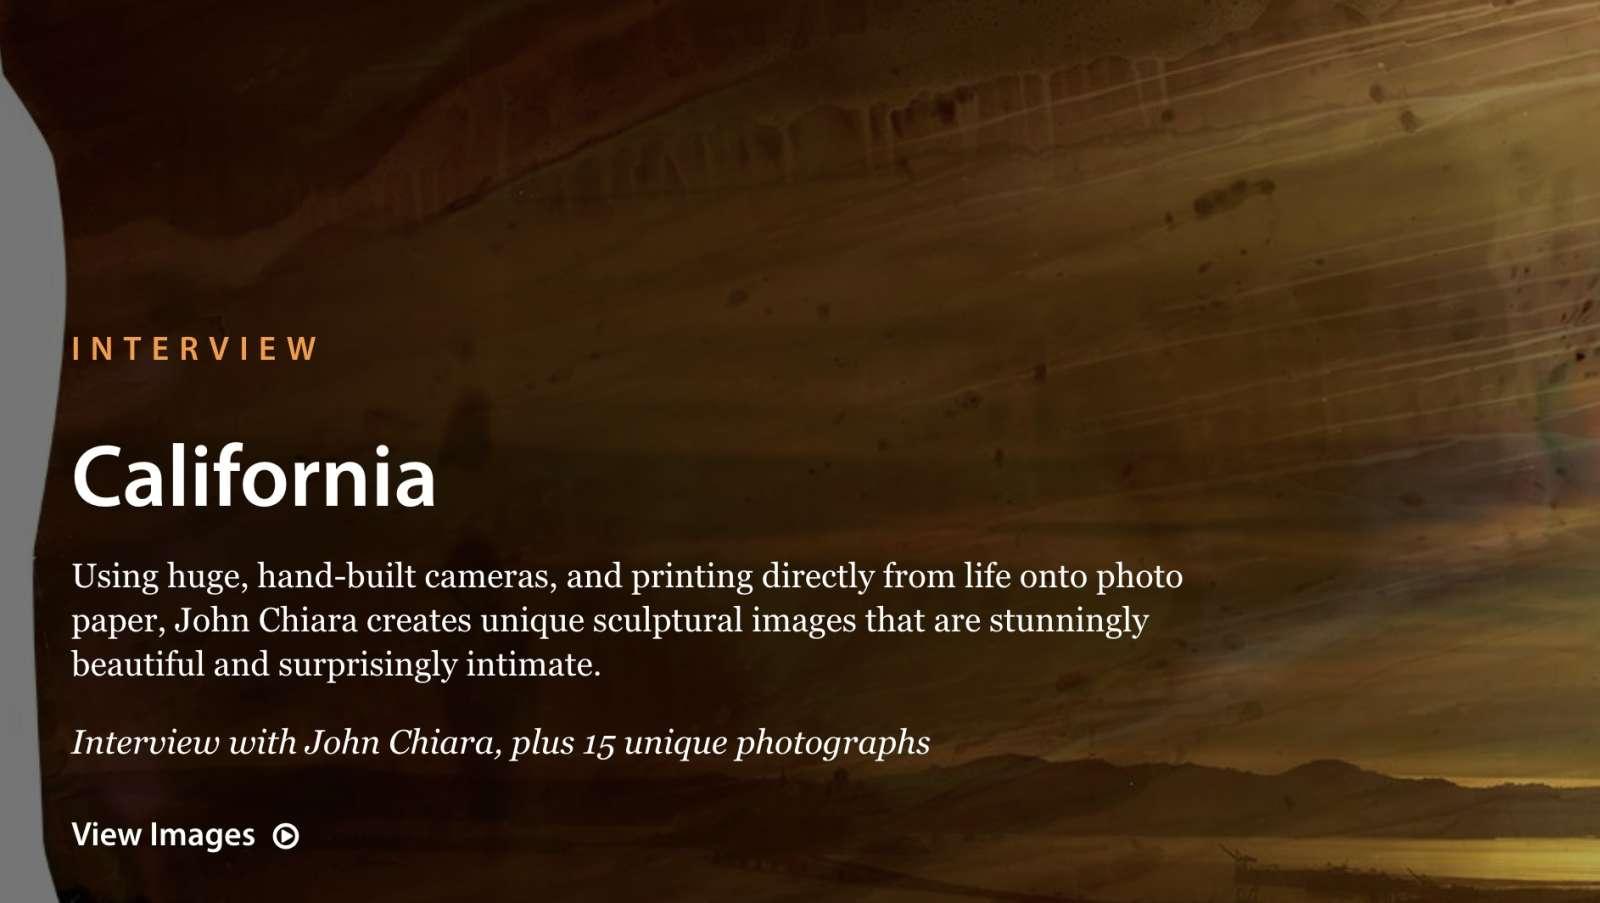 Lensculture: California